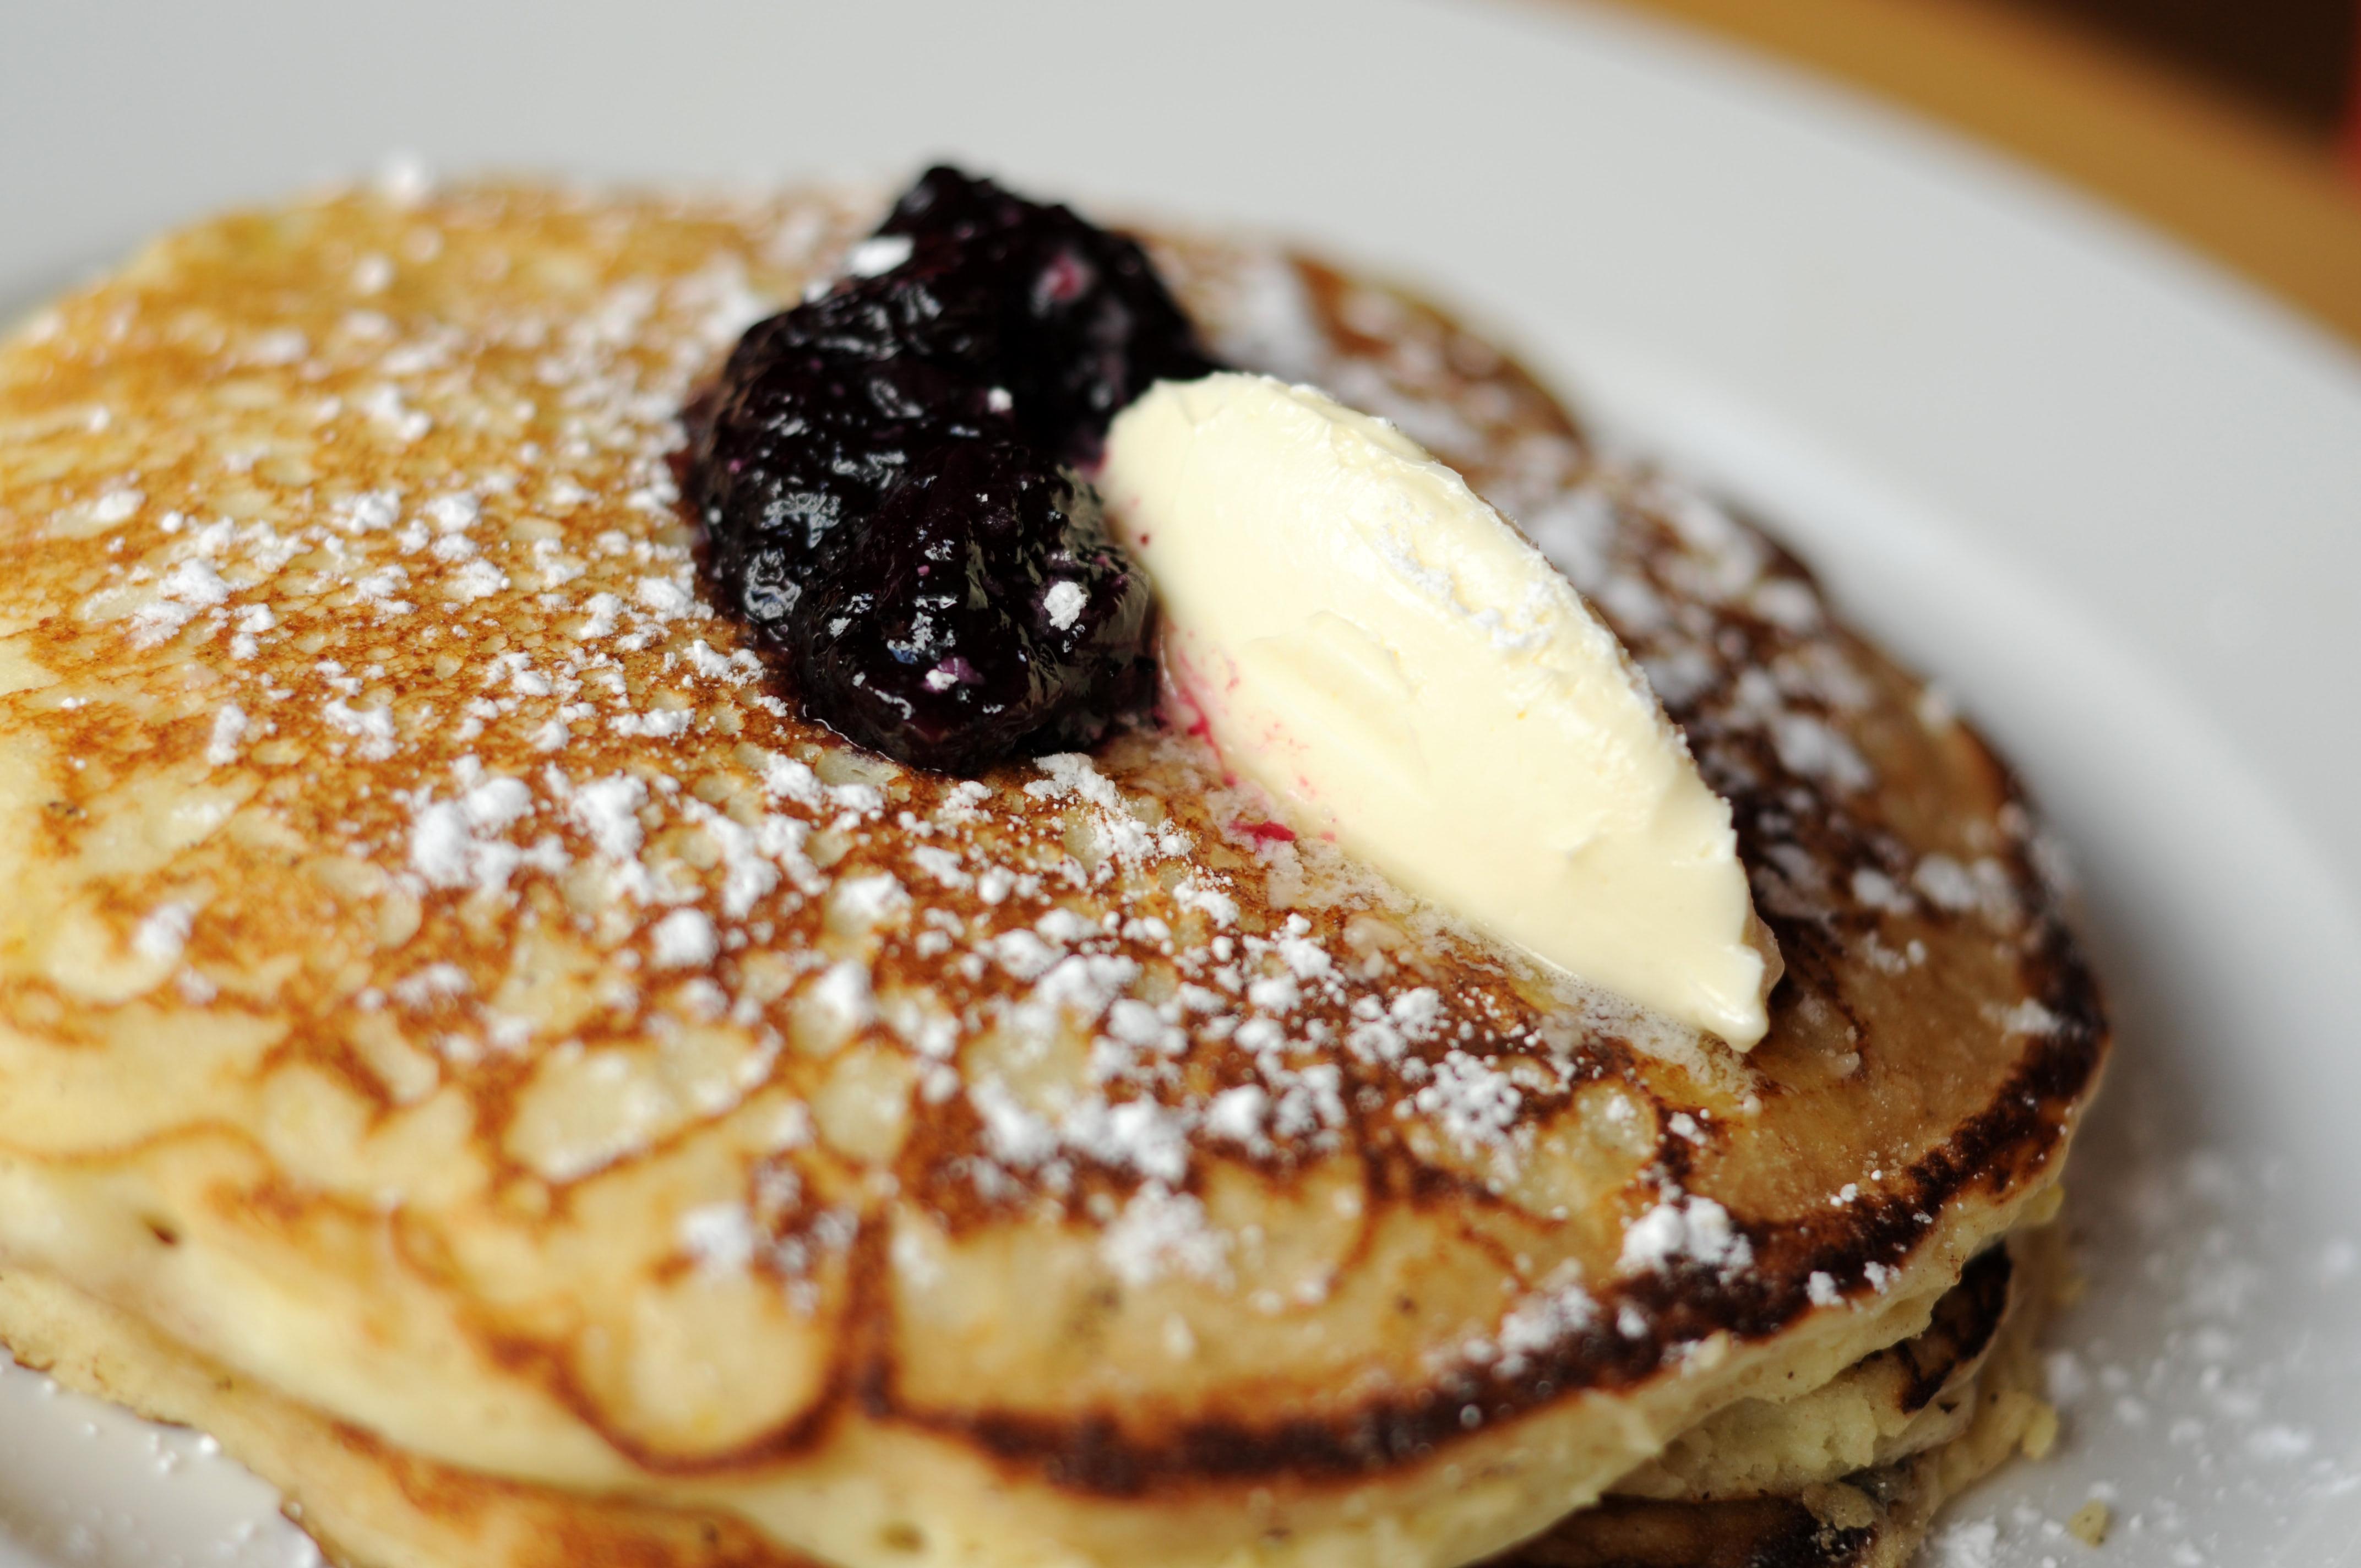 Lemon Ricotta Pancakes with blueberries and sweet lemon butter